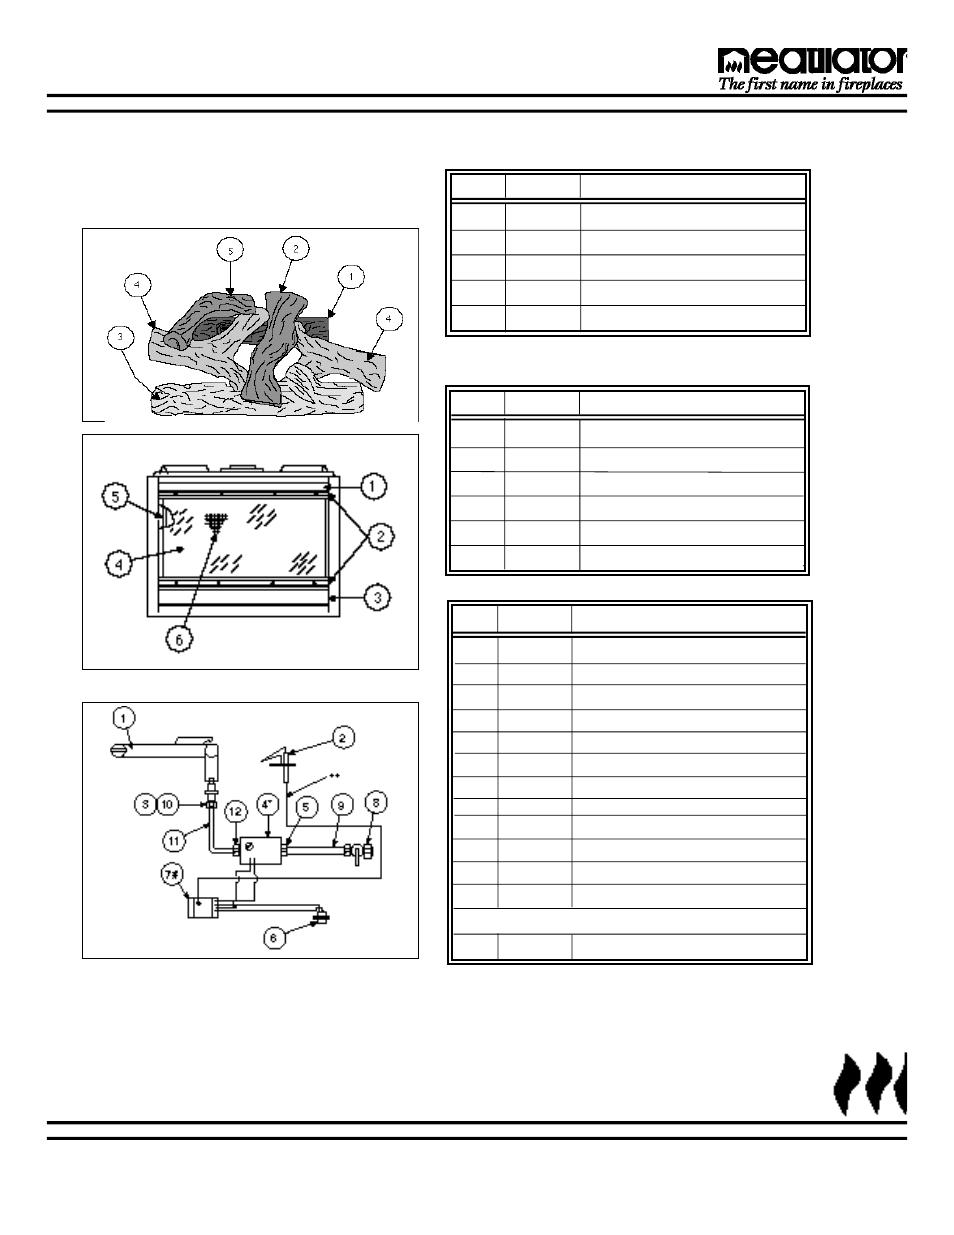 medium resolution of ix replacement parts heatiator heatilator fireplace gc150 user manual page 27 28